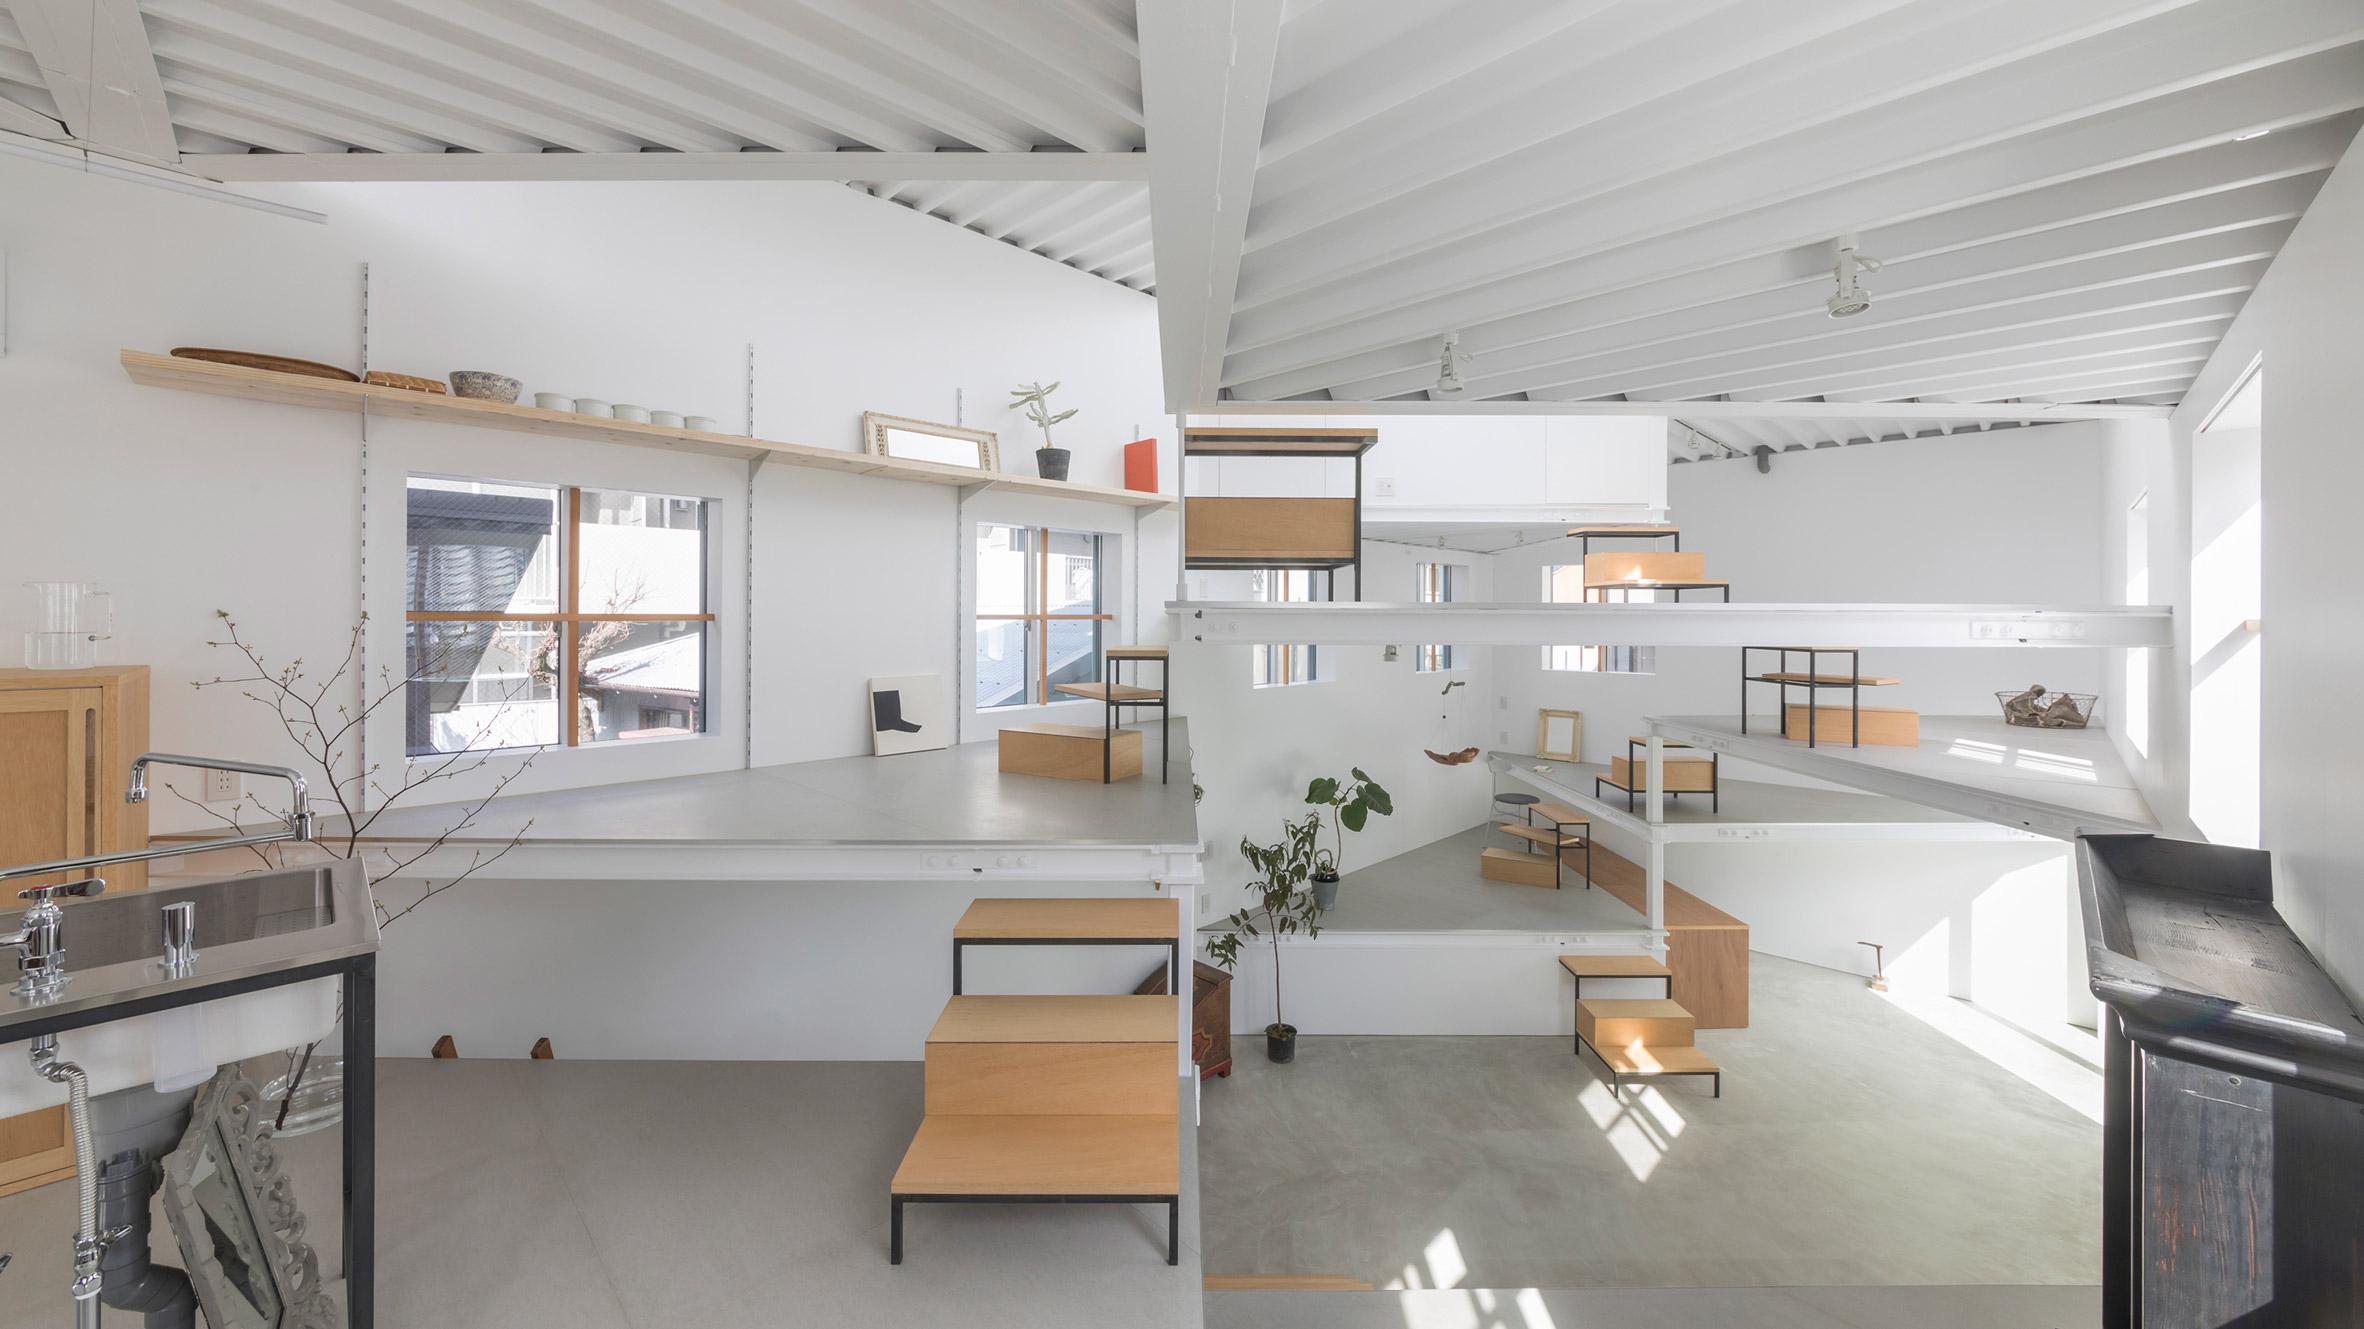 House in Miyamoto, Japan, by Tato Architects